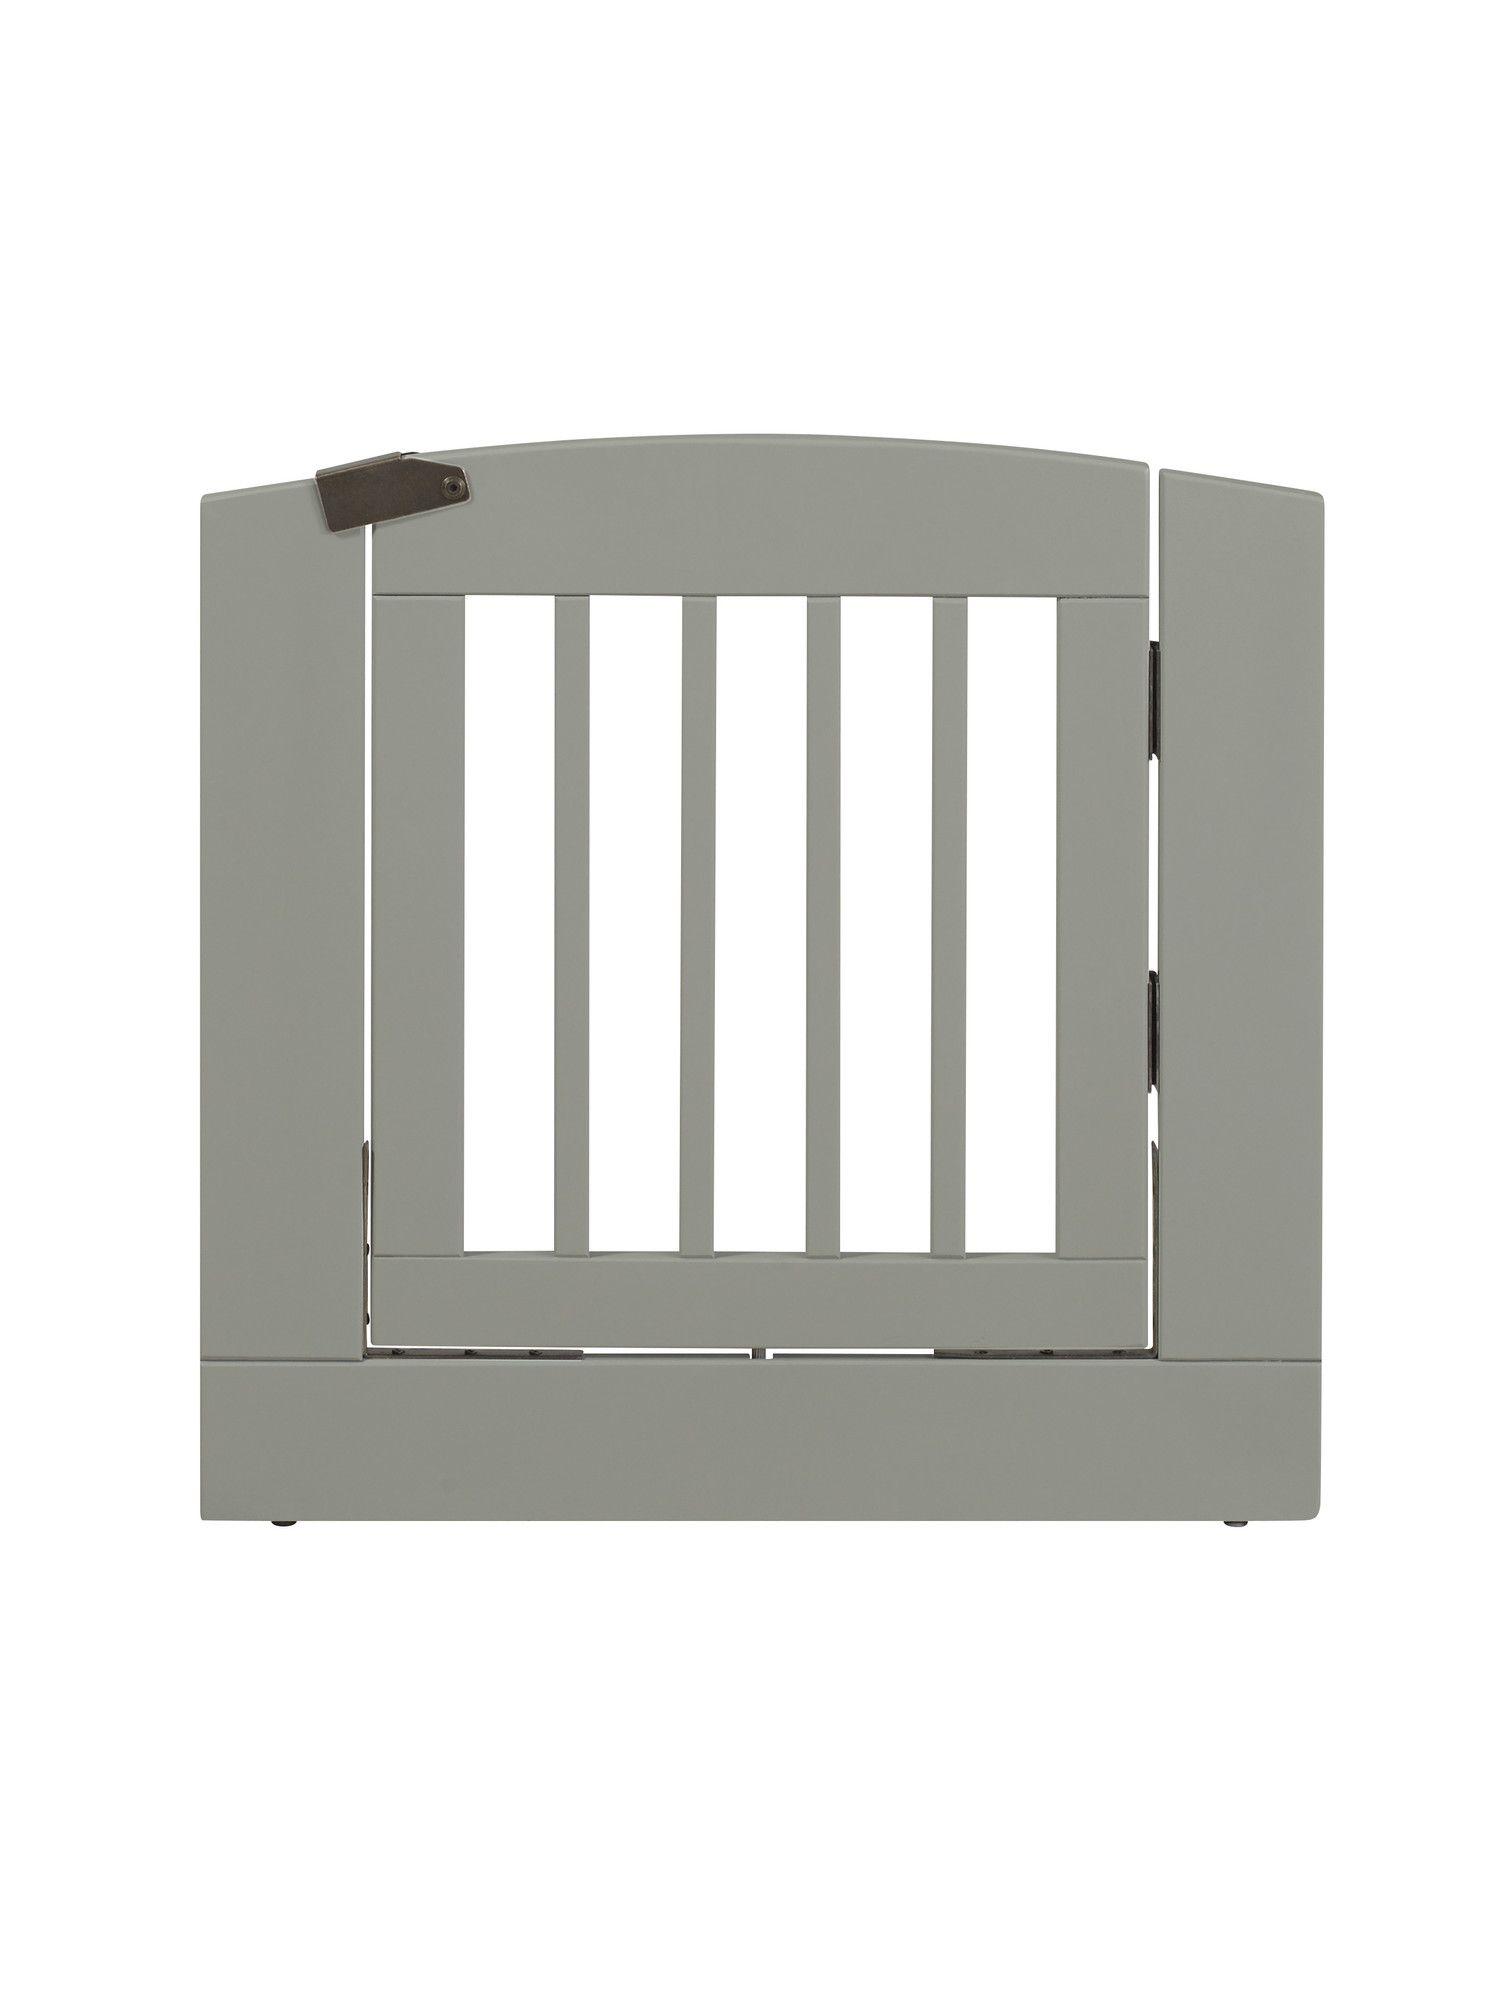 Ruffluv Individual Panel Dog Gate with Door